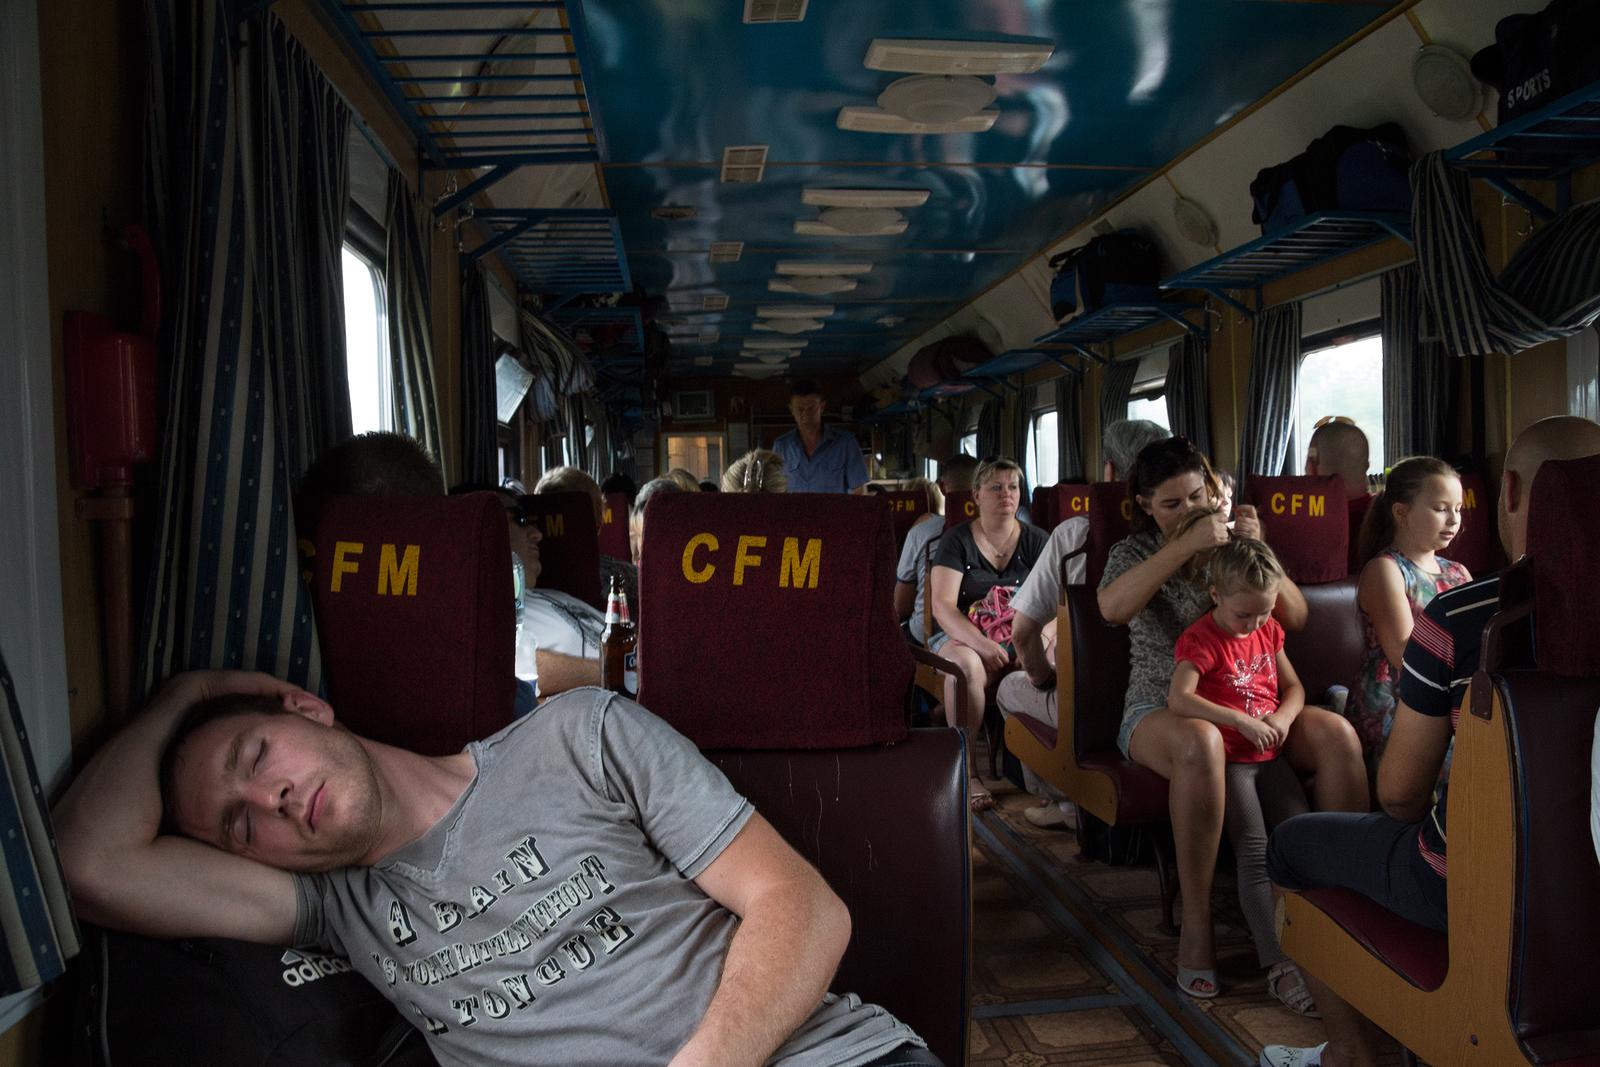 Moldova looks to get failing railways back on track - Emerging Europe | News, Intelligence, Community